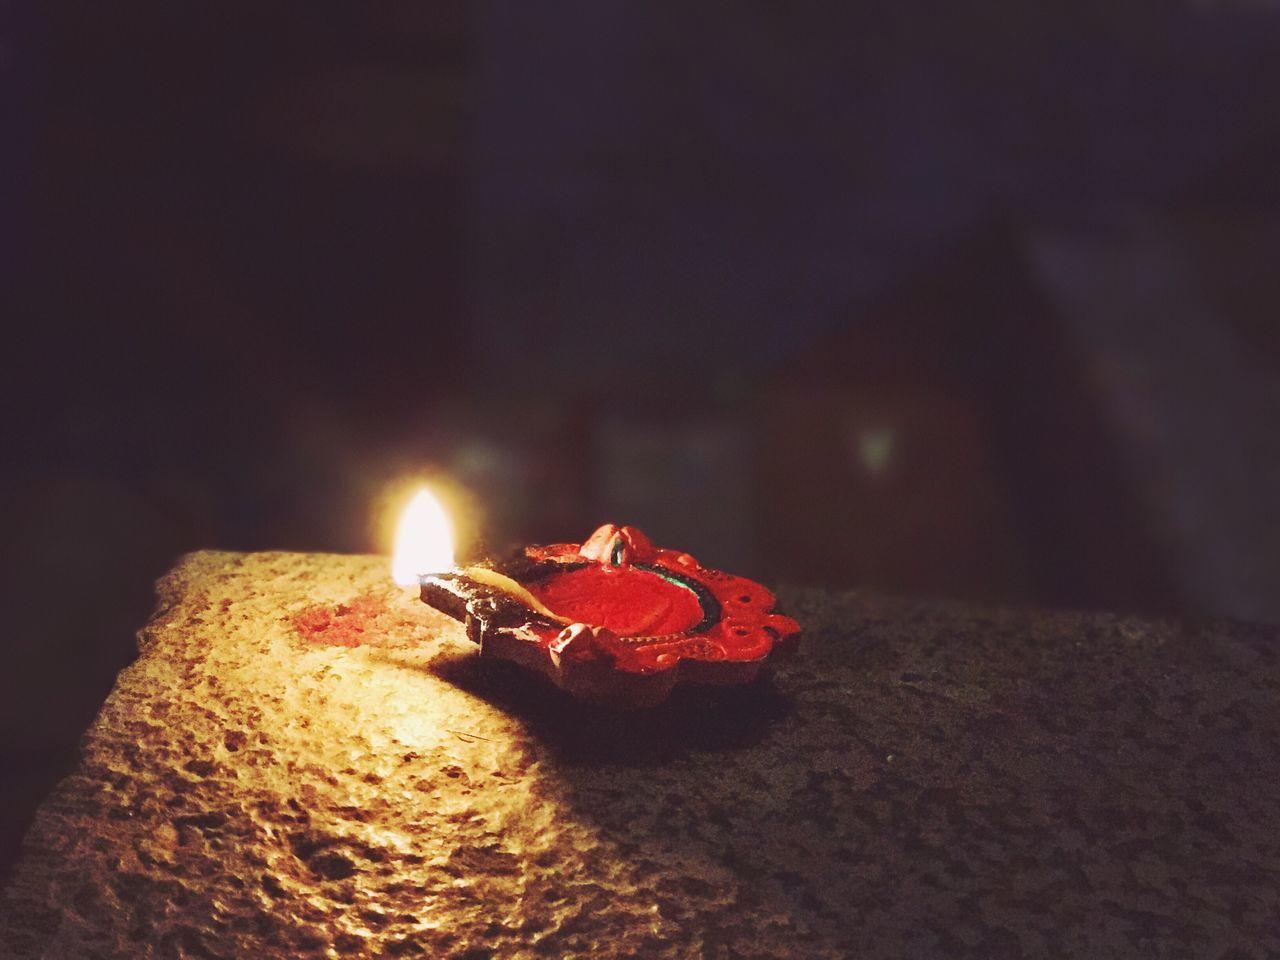 flame, burning, heat - temperature, candle, night, glowing, illuminated, close-up, diya - oil lamp, celebration, no people, diwali, indoors, oil lamp